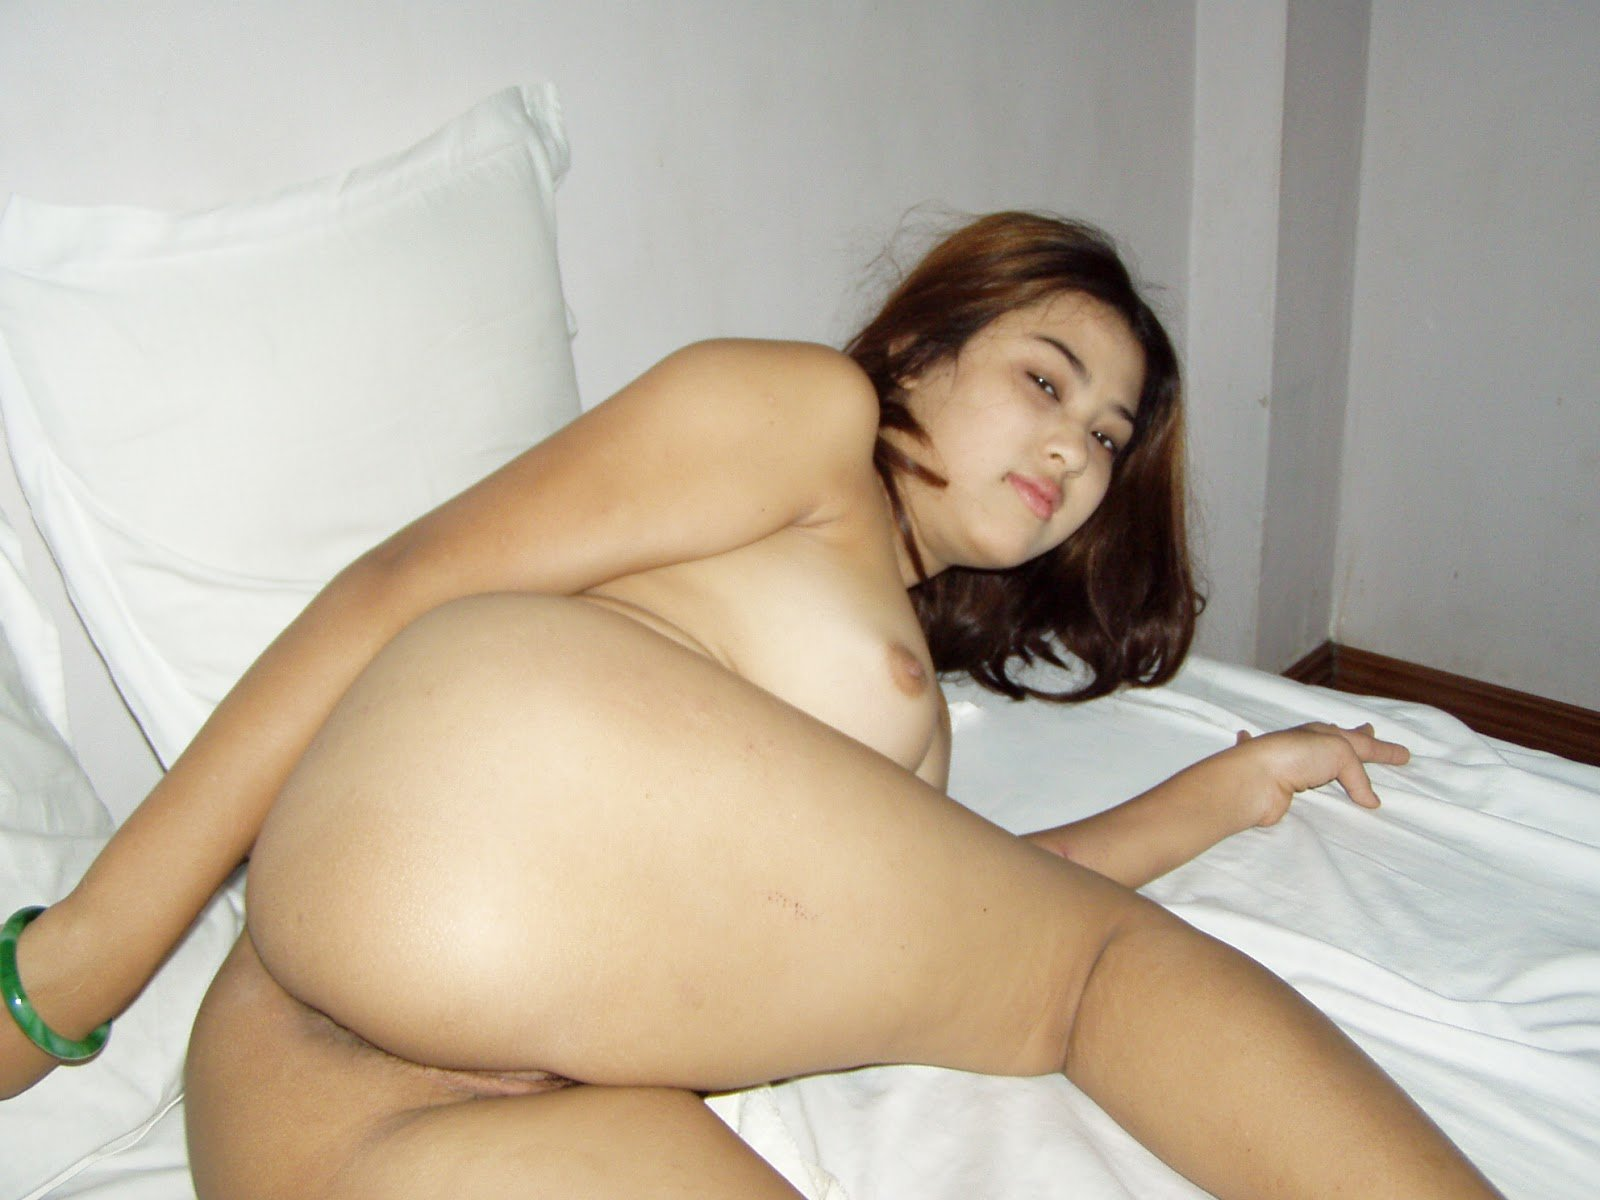 Myanmar porn sites